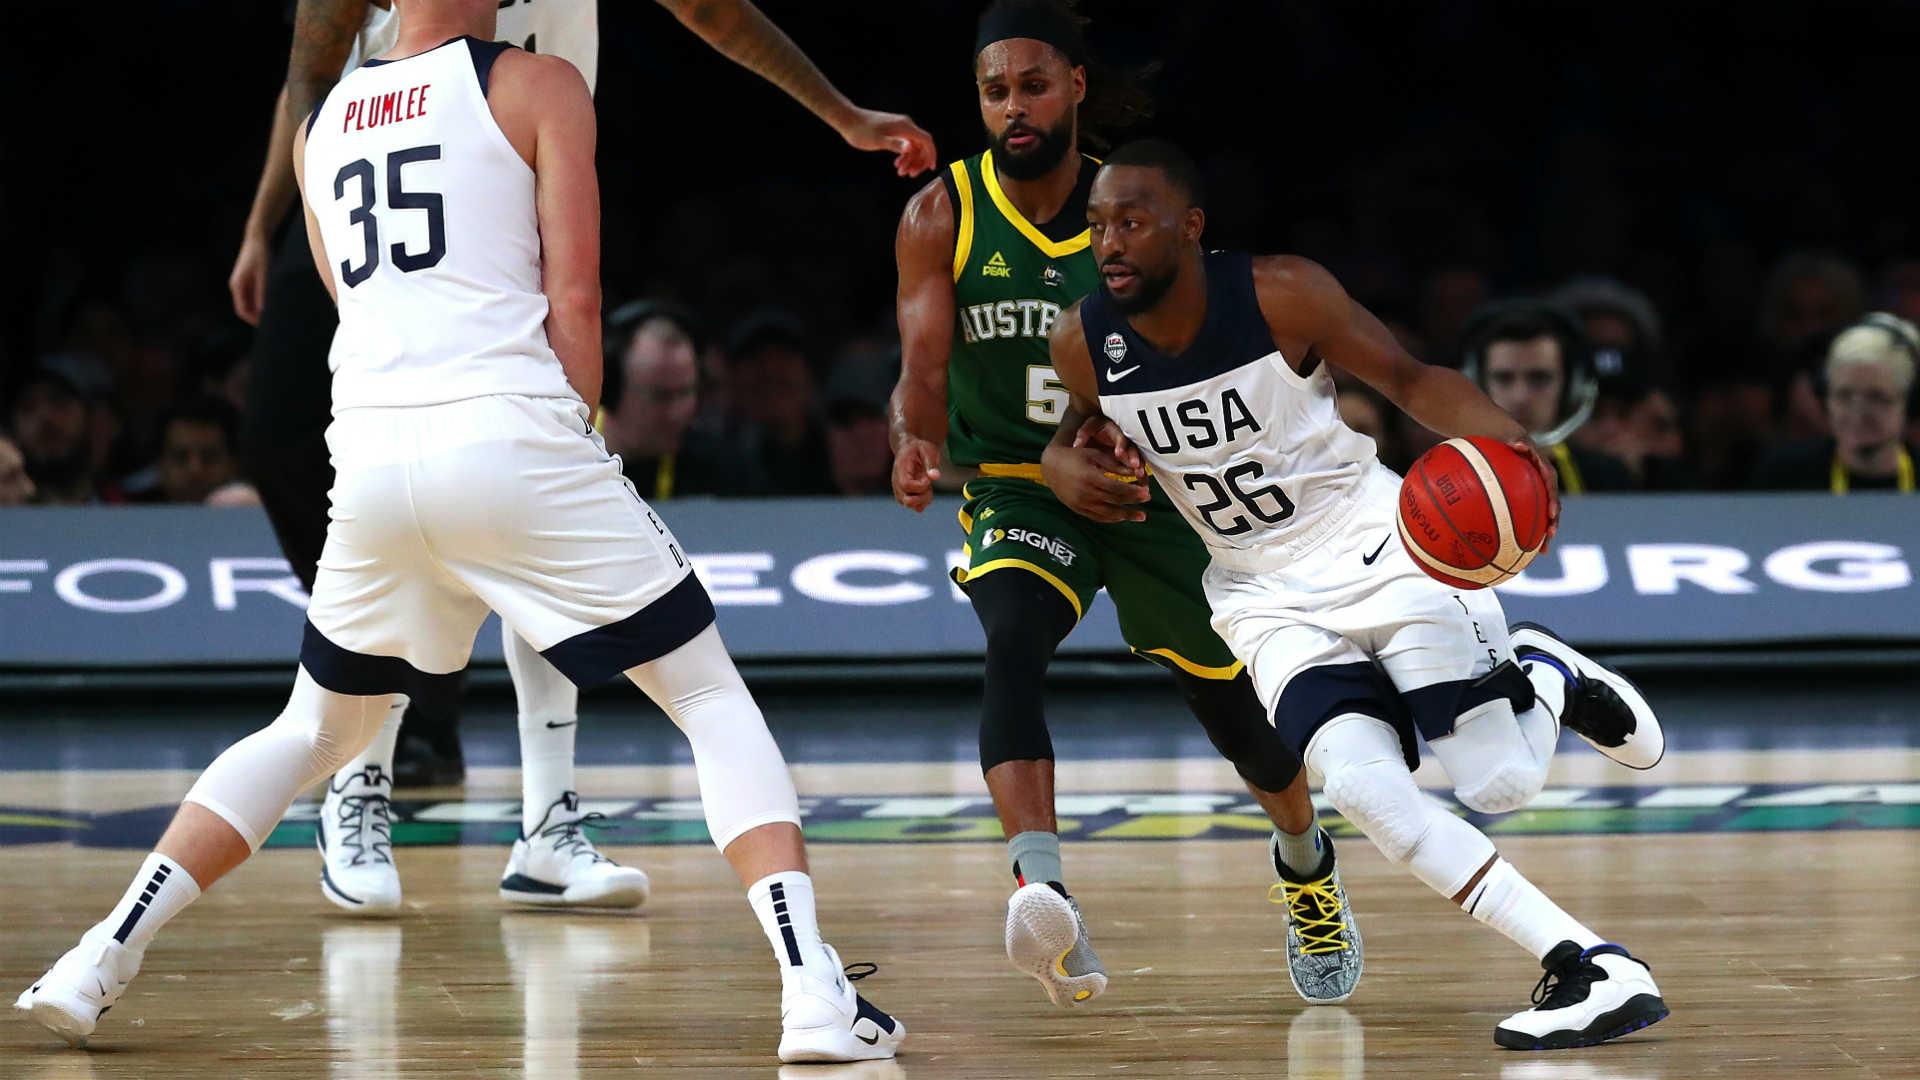 FIBA World Cup 2019: Team USA tops Australia in exhibition before 50,000 in Melbourne